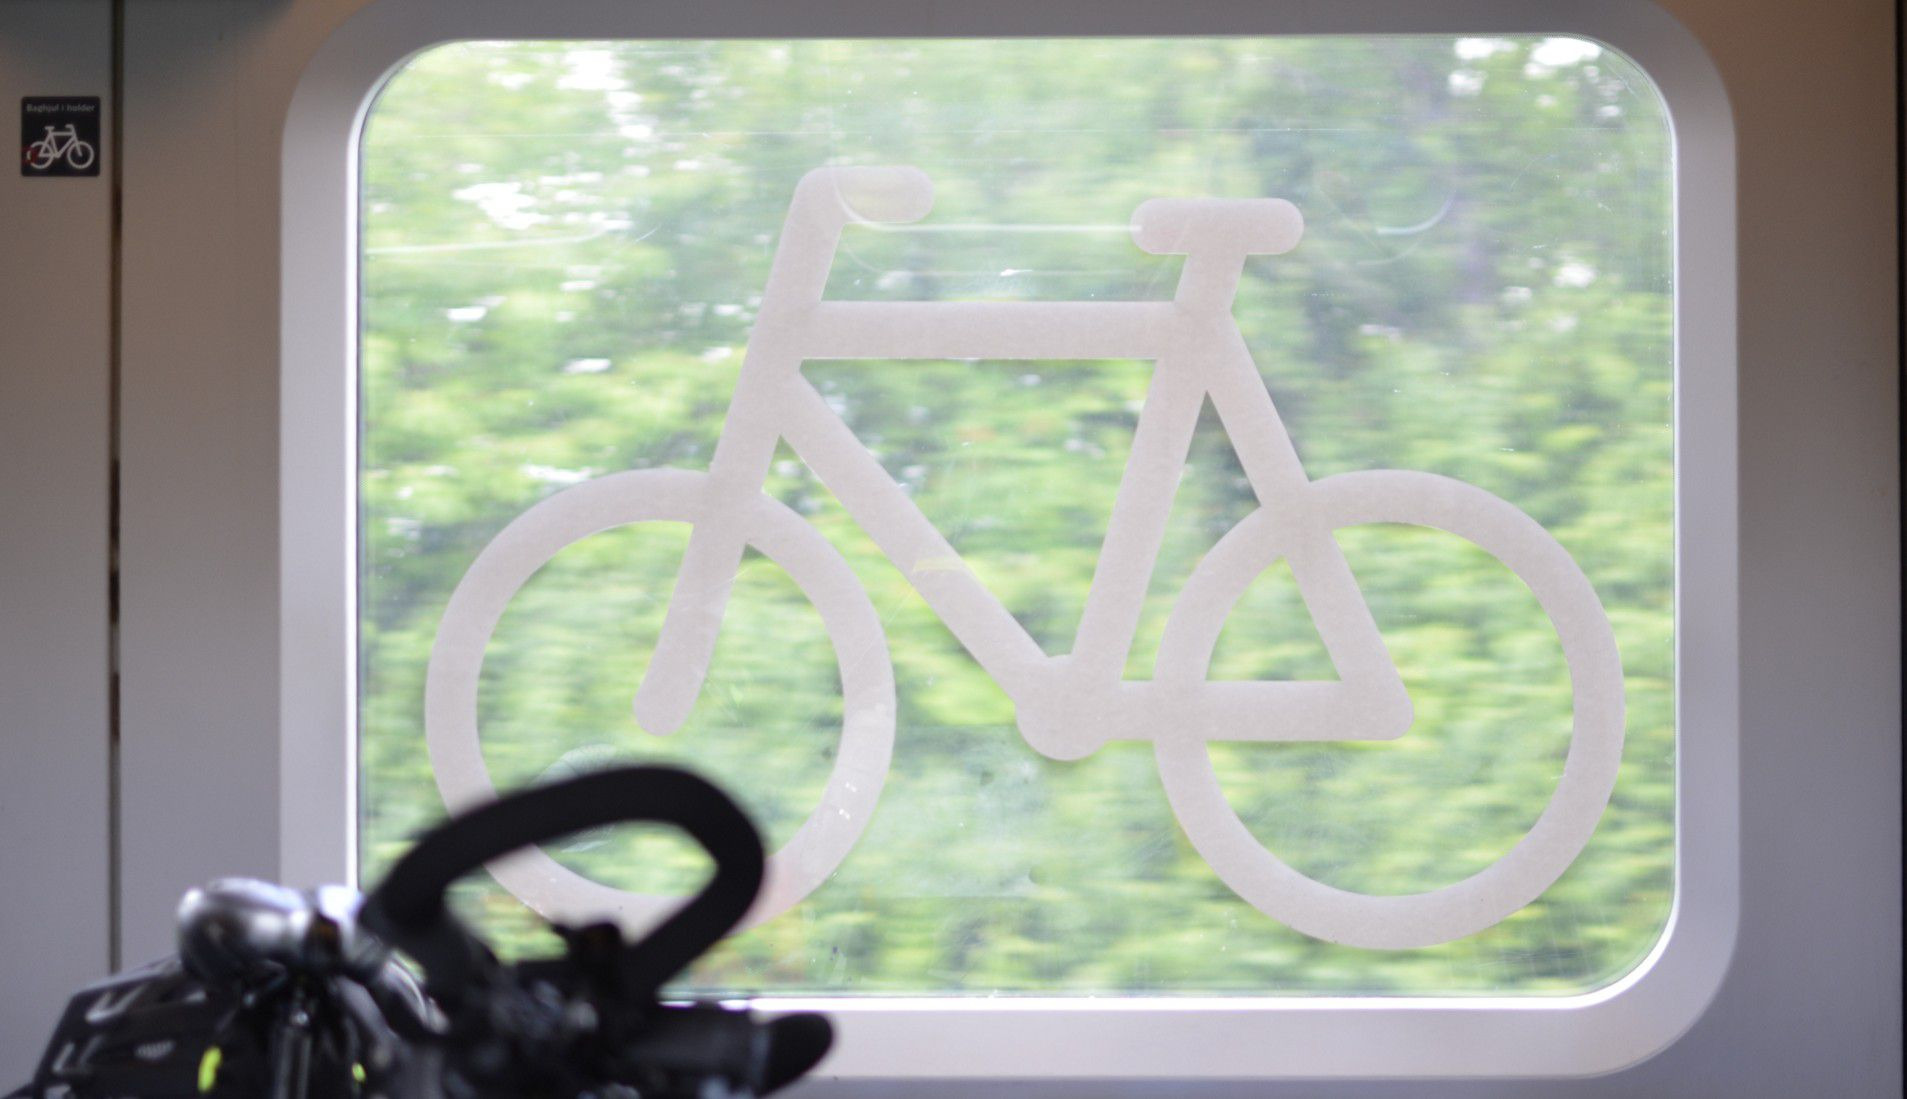 Ta' toget på cykeltur